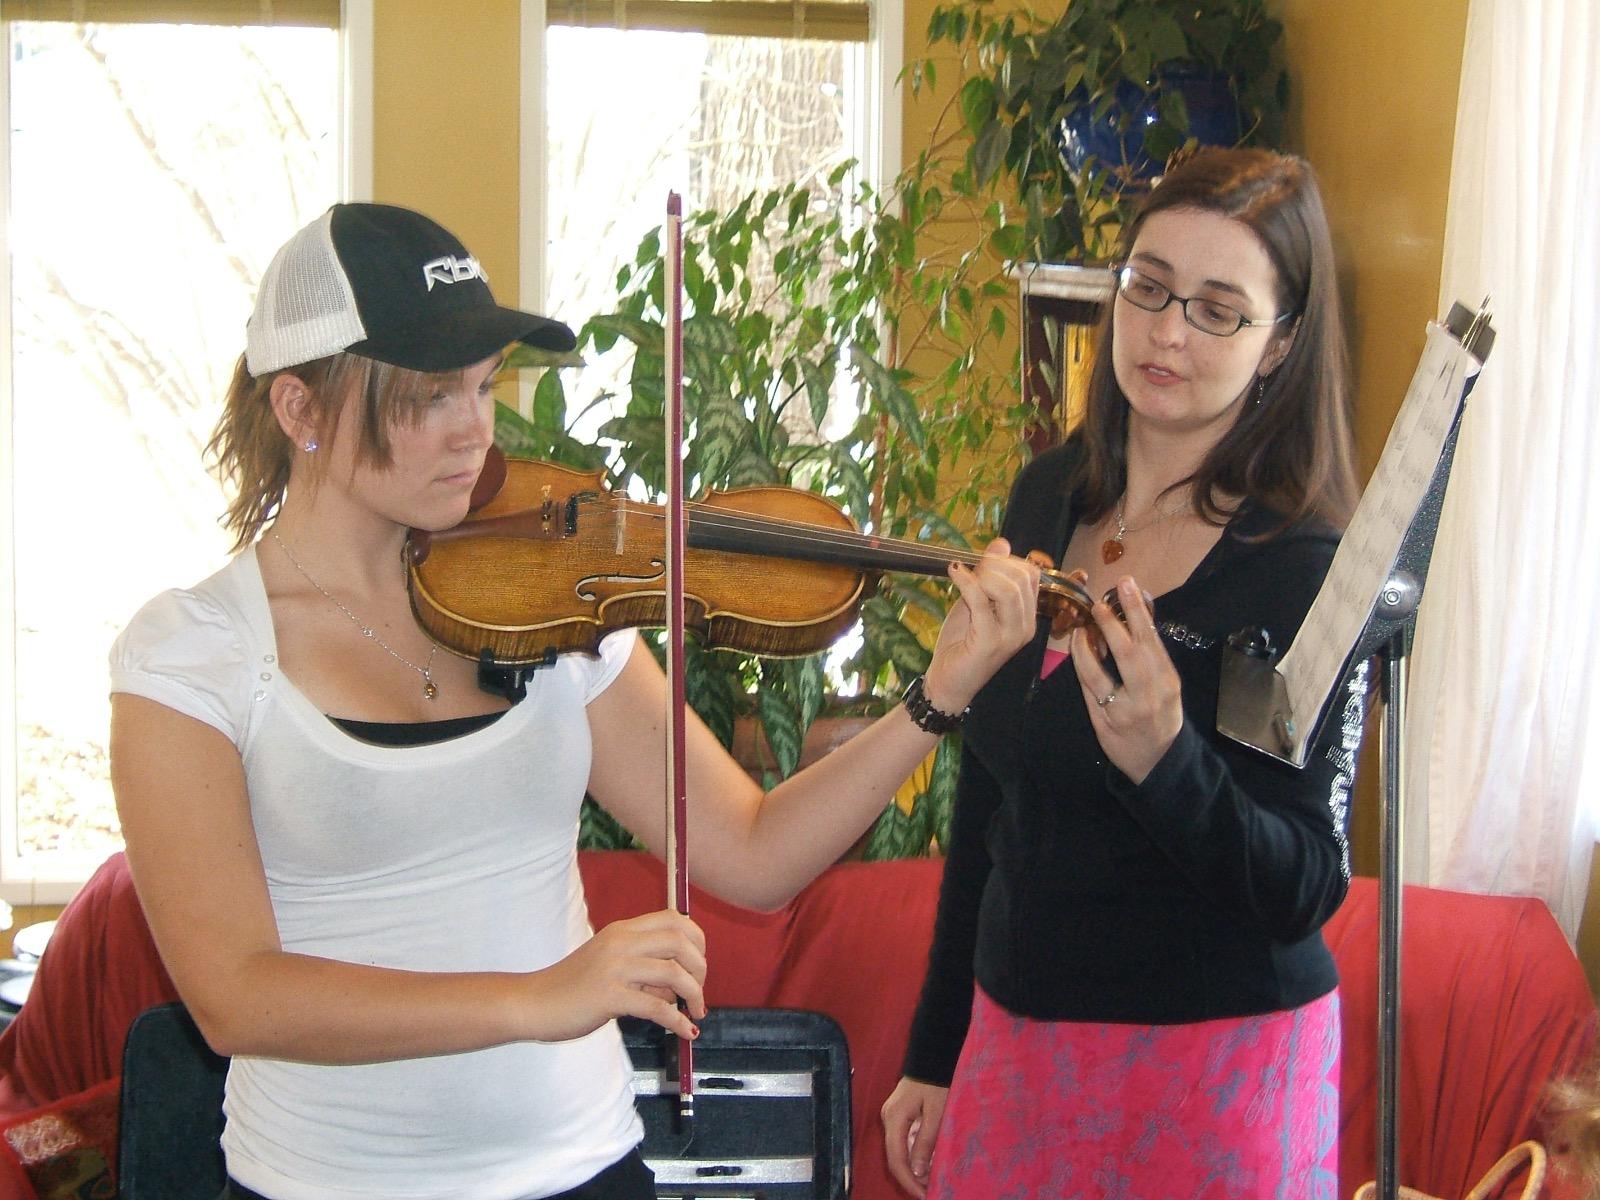 Rhiannon assisting a teenaged girl playing a violin